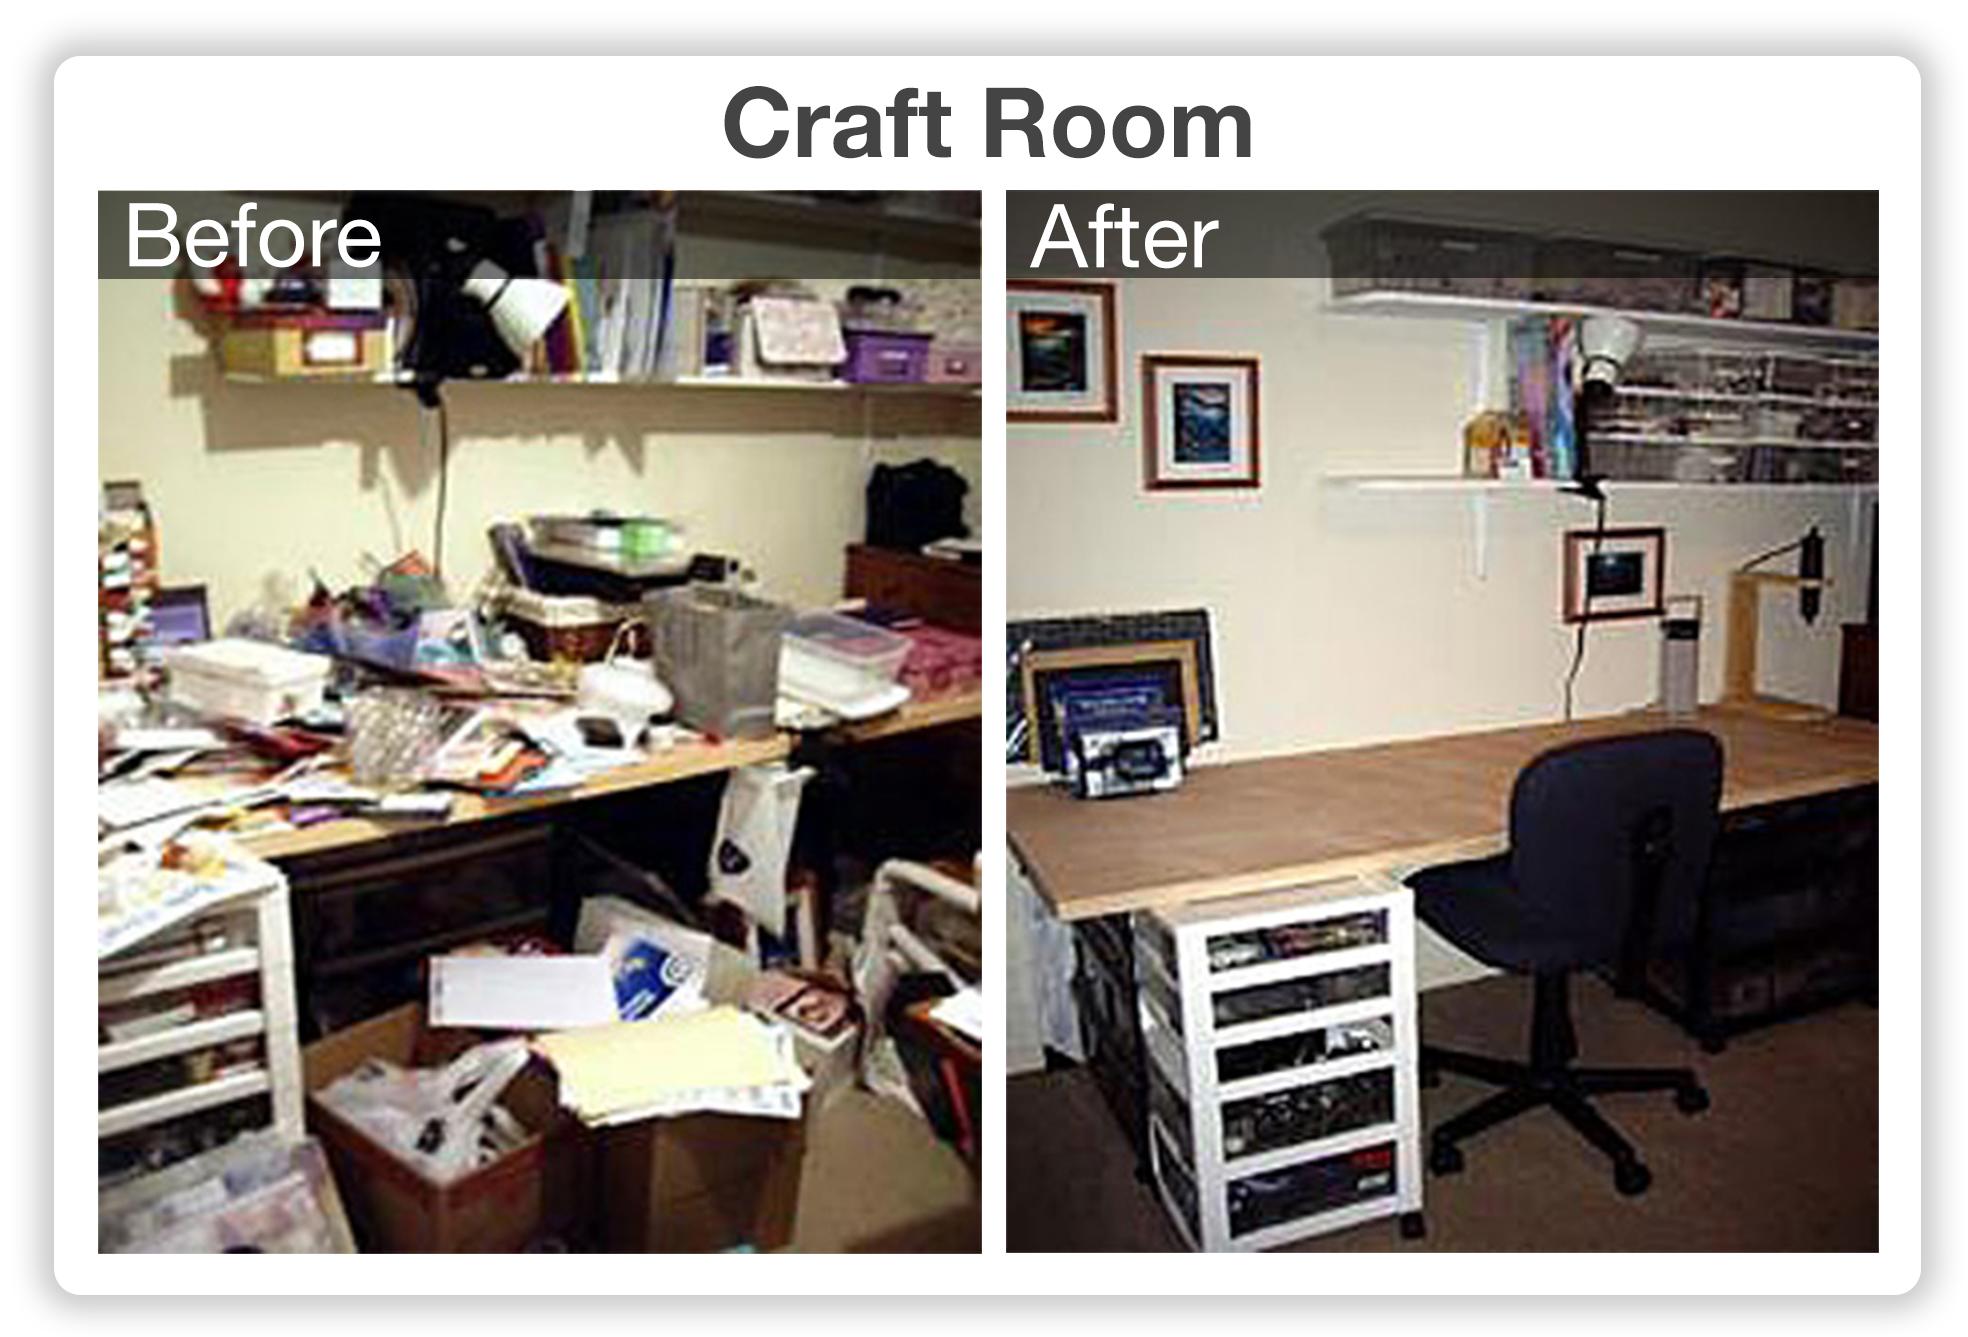 organized_by_choice_craft_room_2.jpg